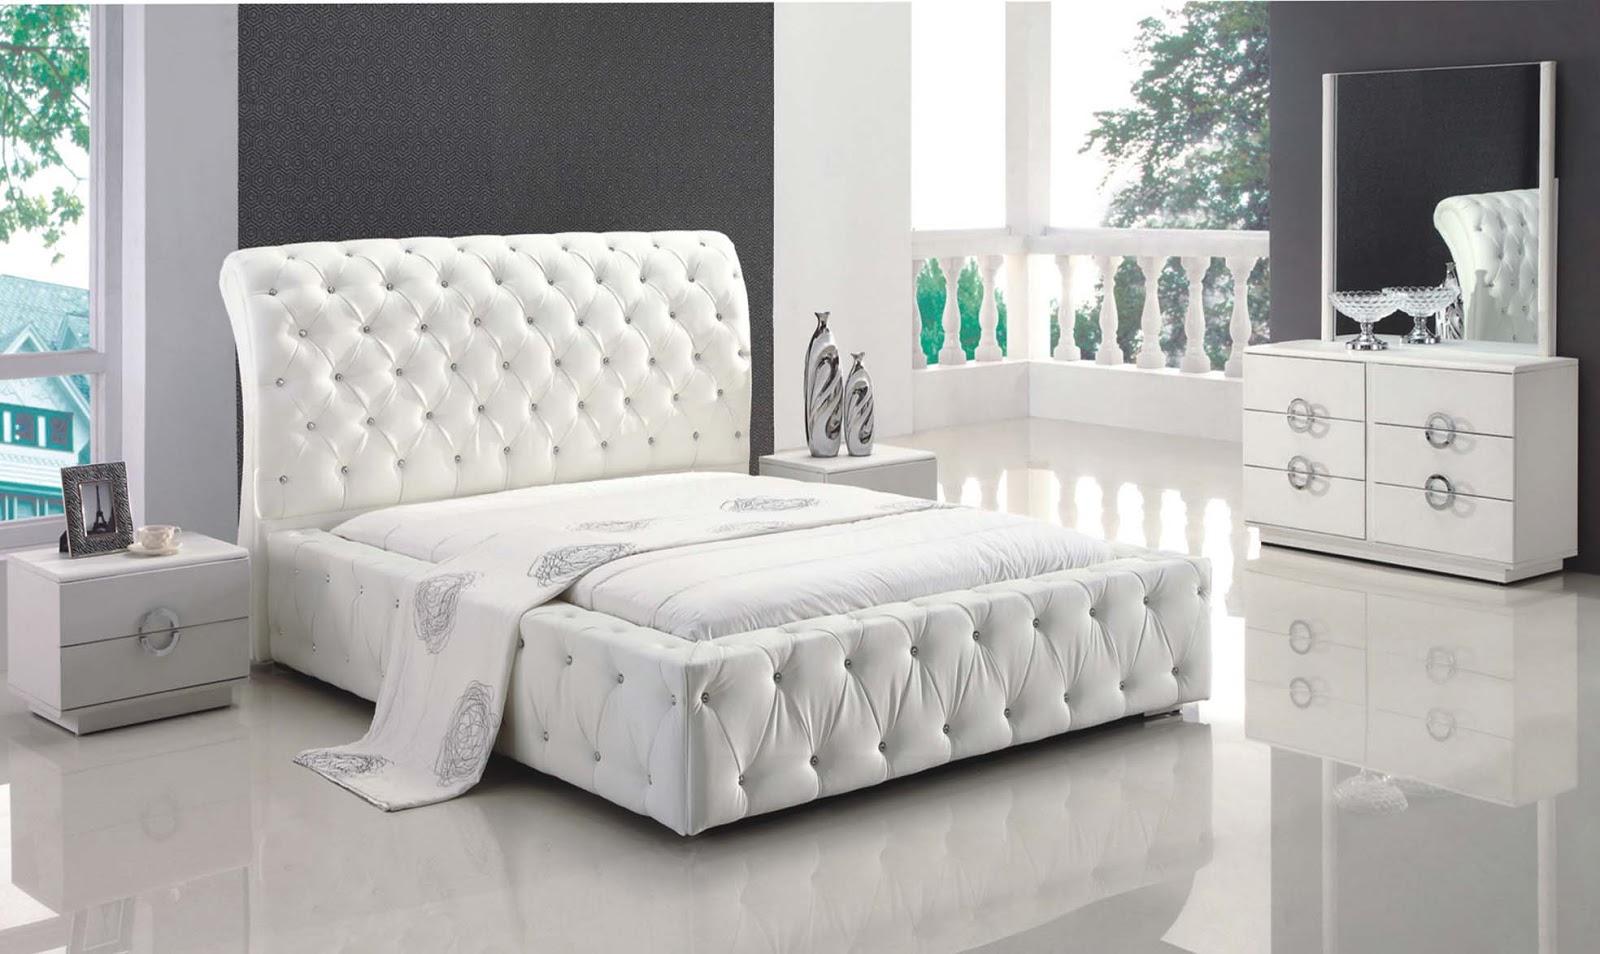 White Painted Bedroom Furniture Platform Bedroom Furniture Sets Modern  Leather Bedroom Sets